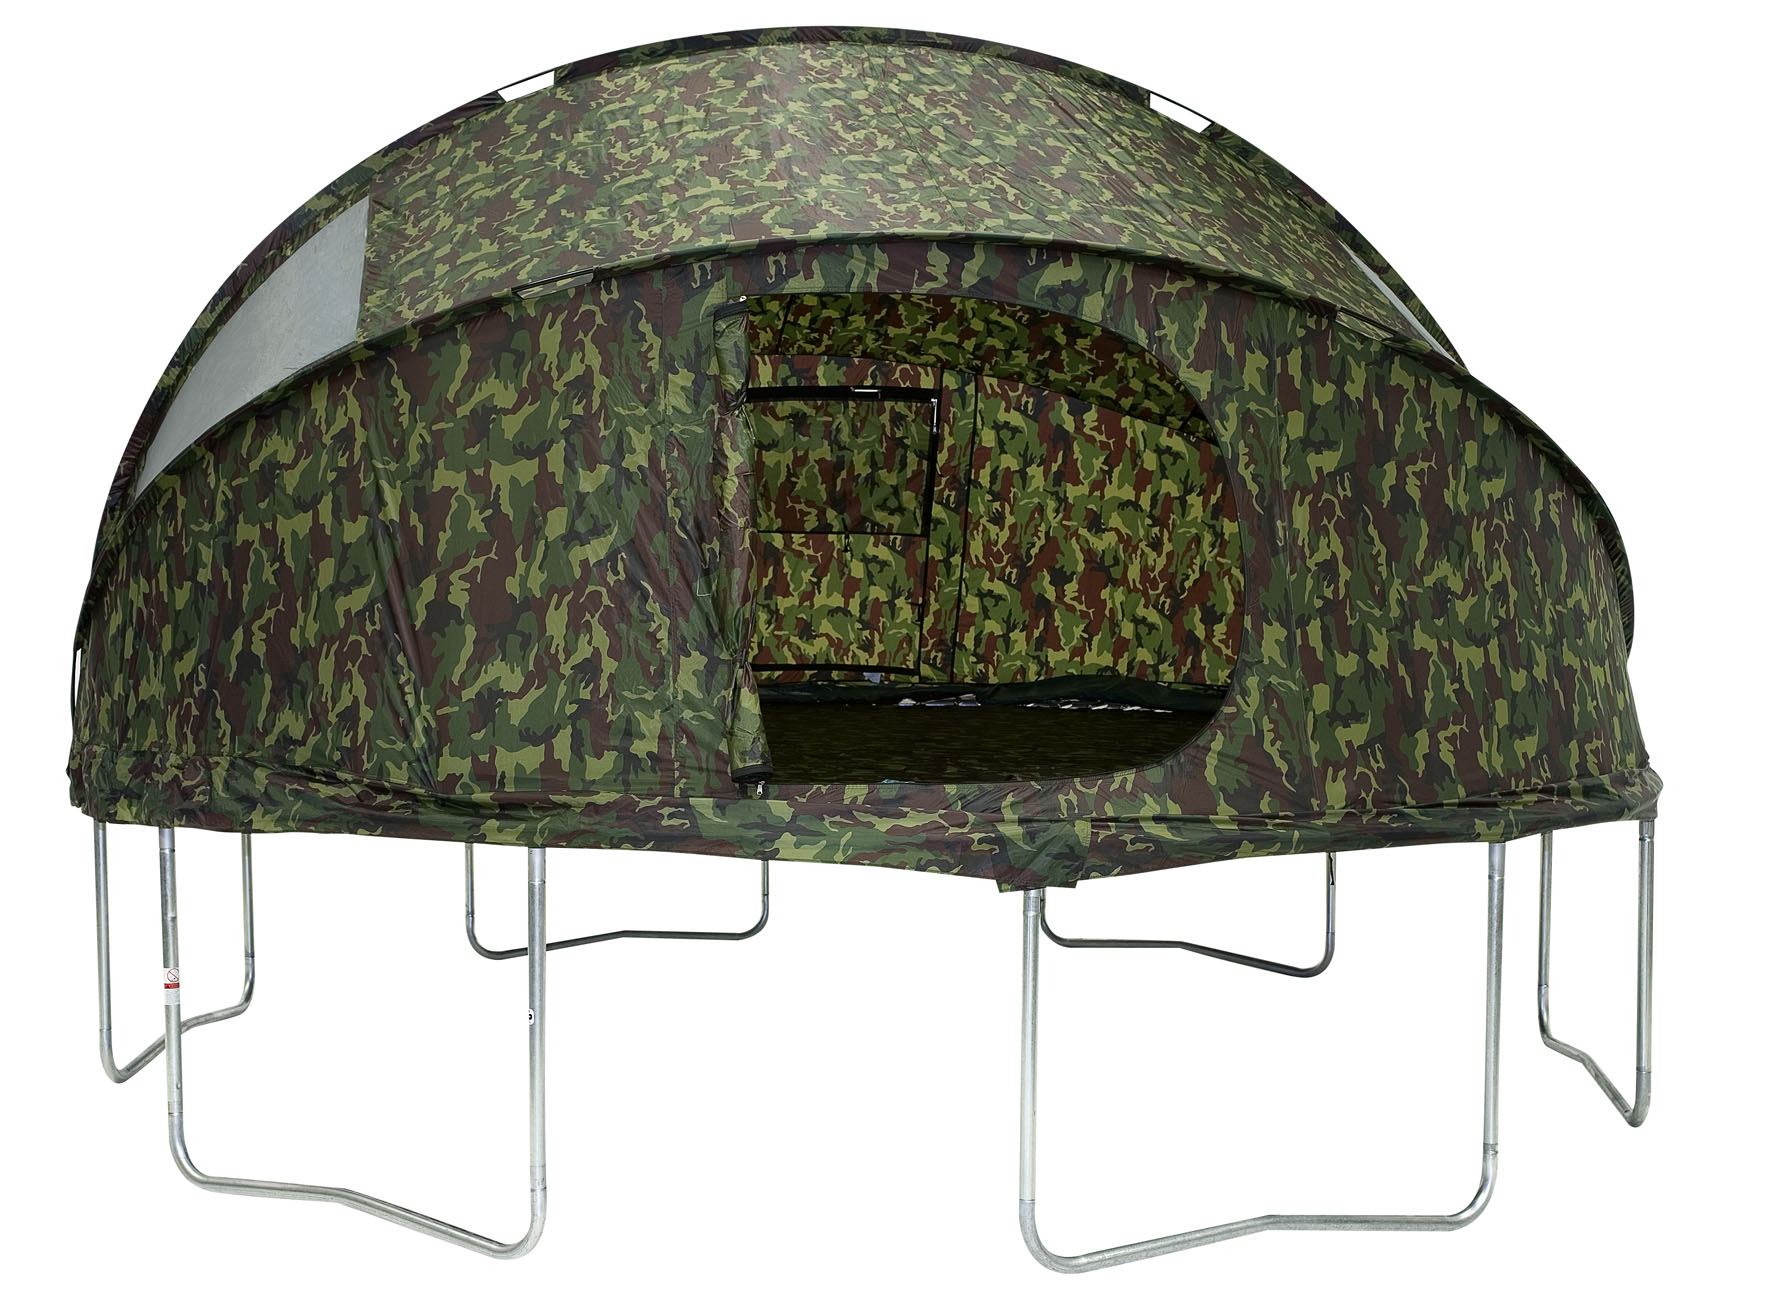 Etan trampoline tent 14 4.30m army